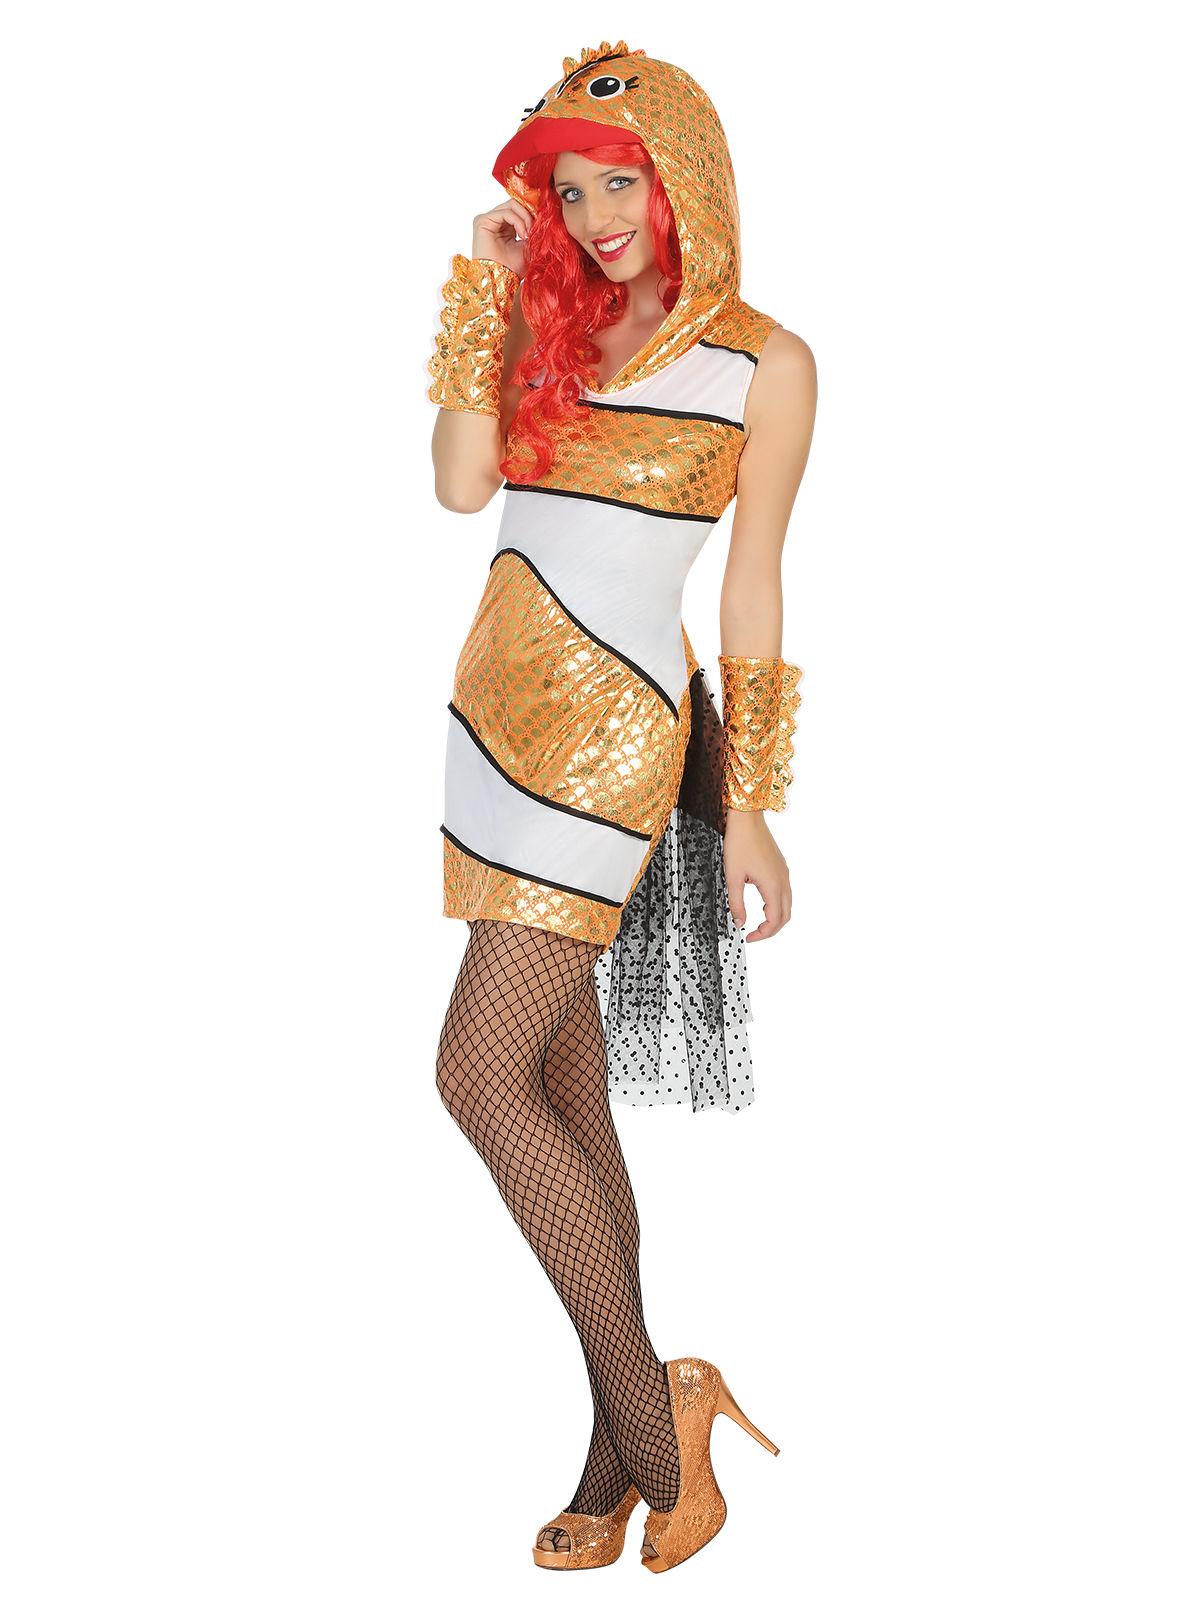 D guisement poisson clown femme deguise toi achat de for Achat poisson clown